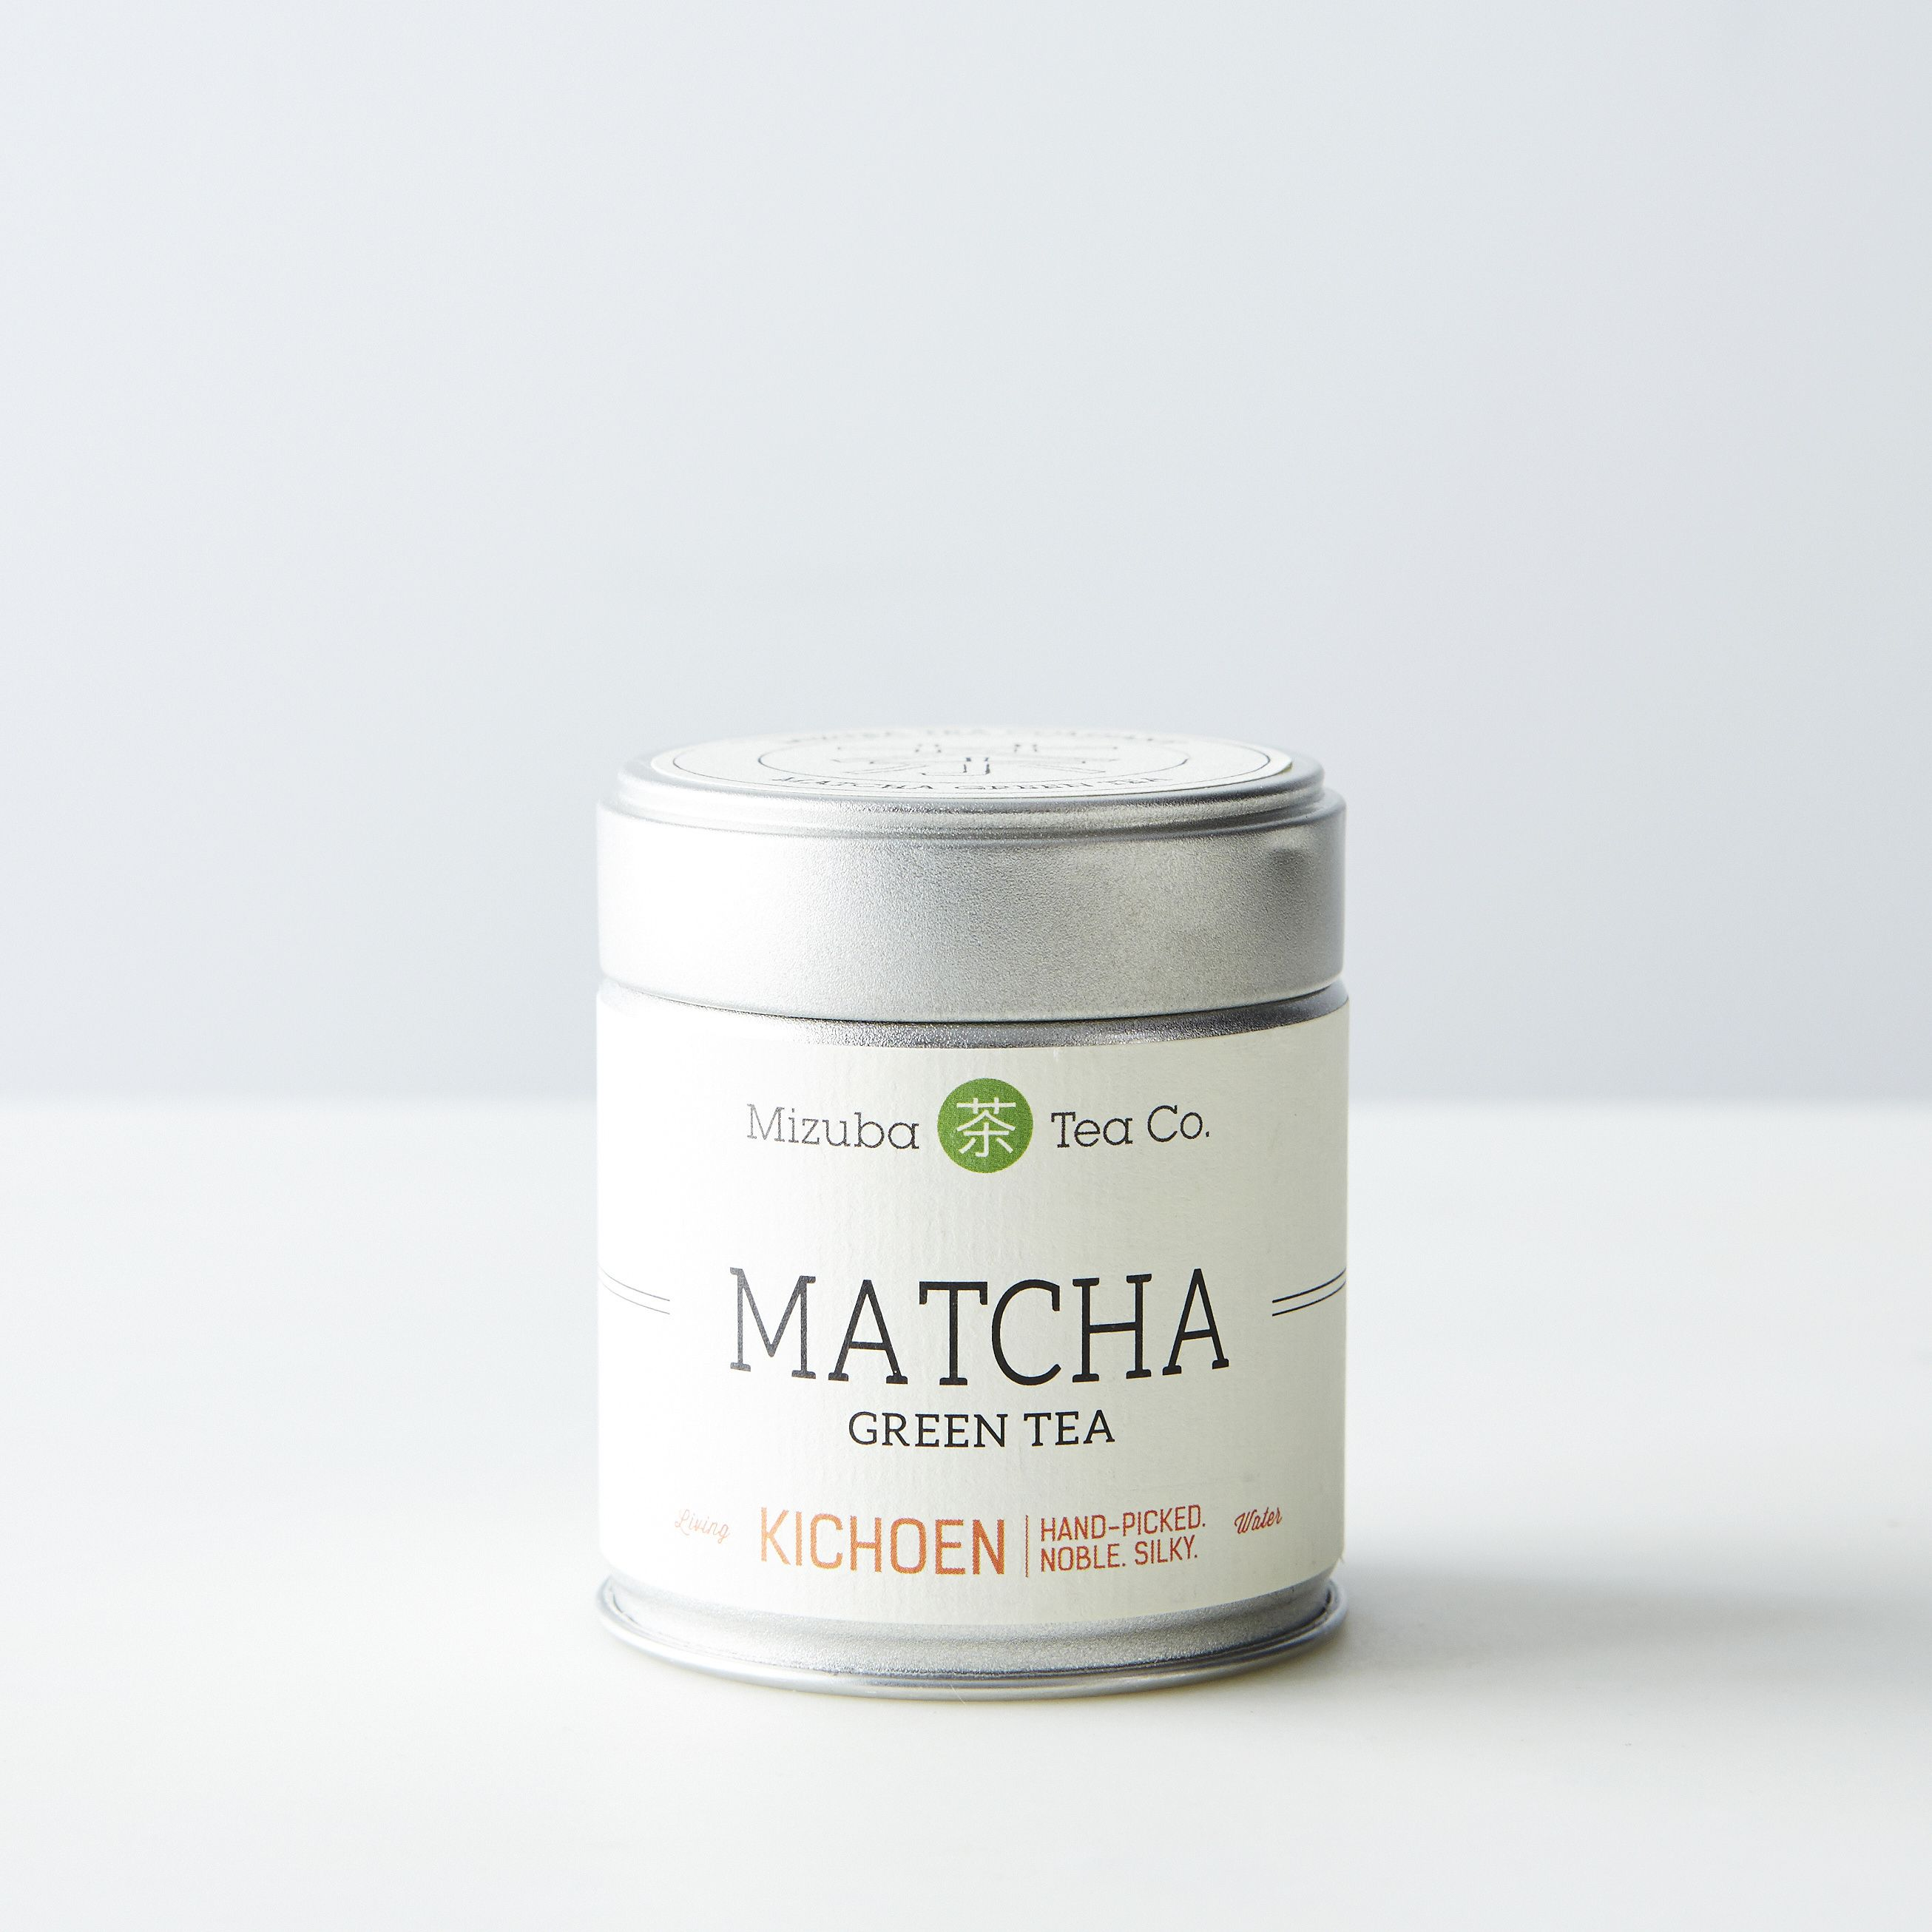 A3956a96 a0f7 11e5 a190 0ef7535729df  2015 0121 mizuba tea japanese matcha green tea kichoen ceremonial mw silo 161